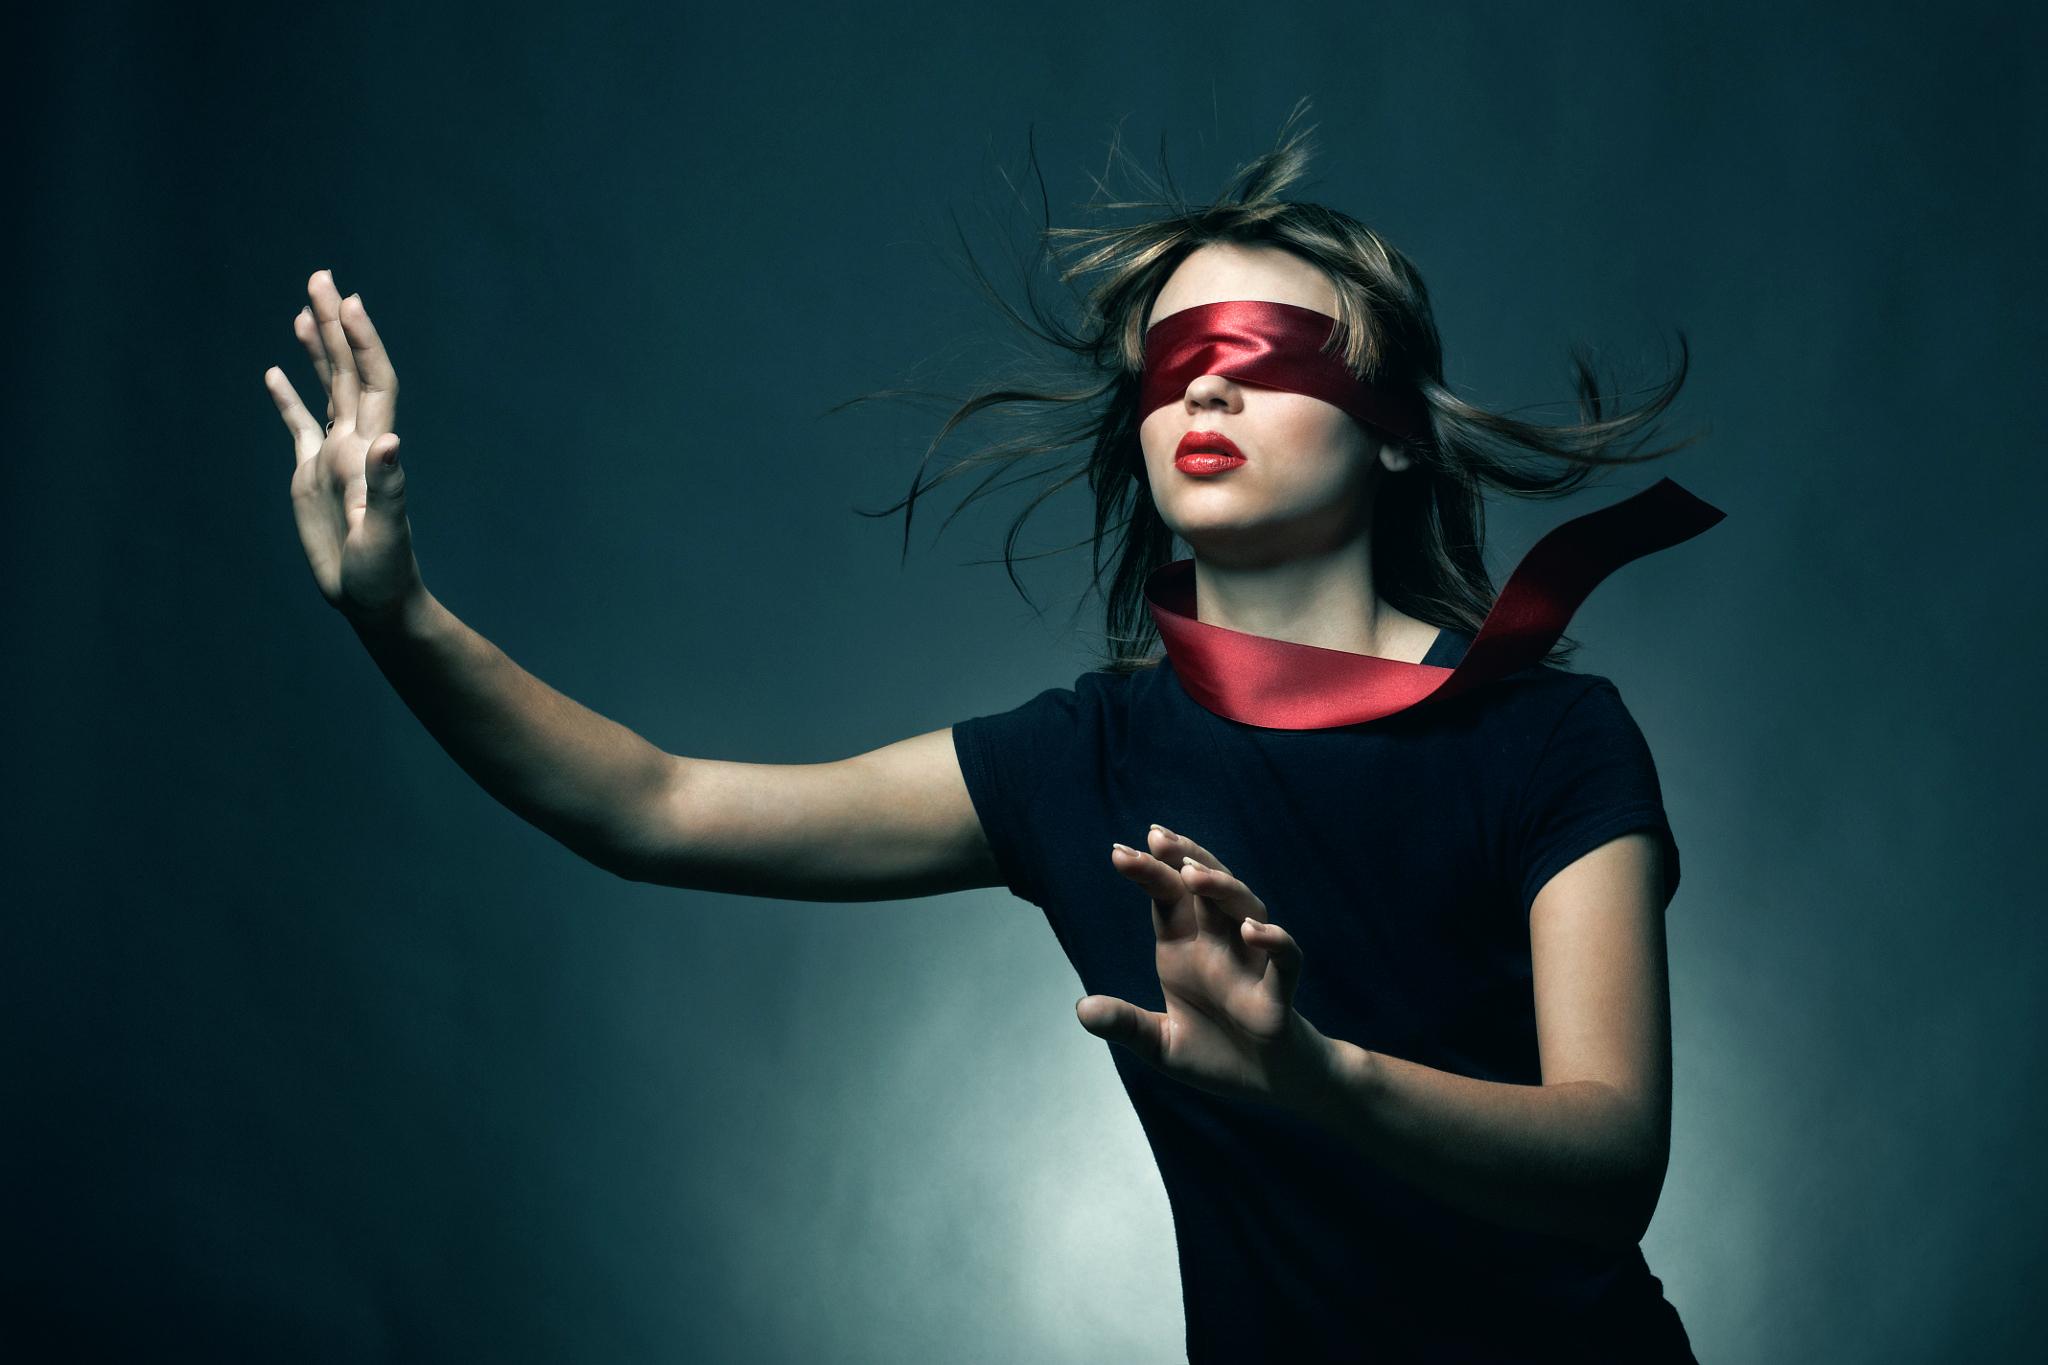 Картинки слепая девочка